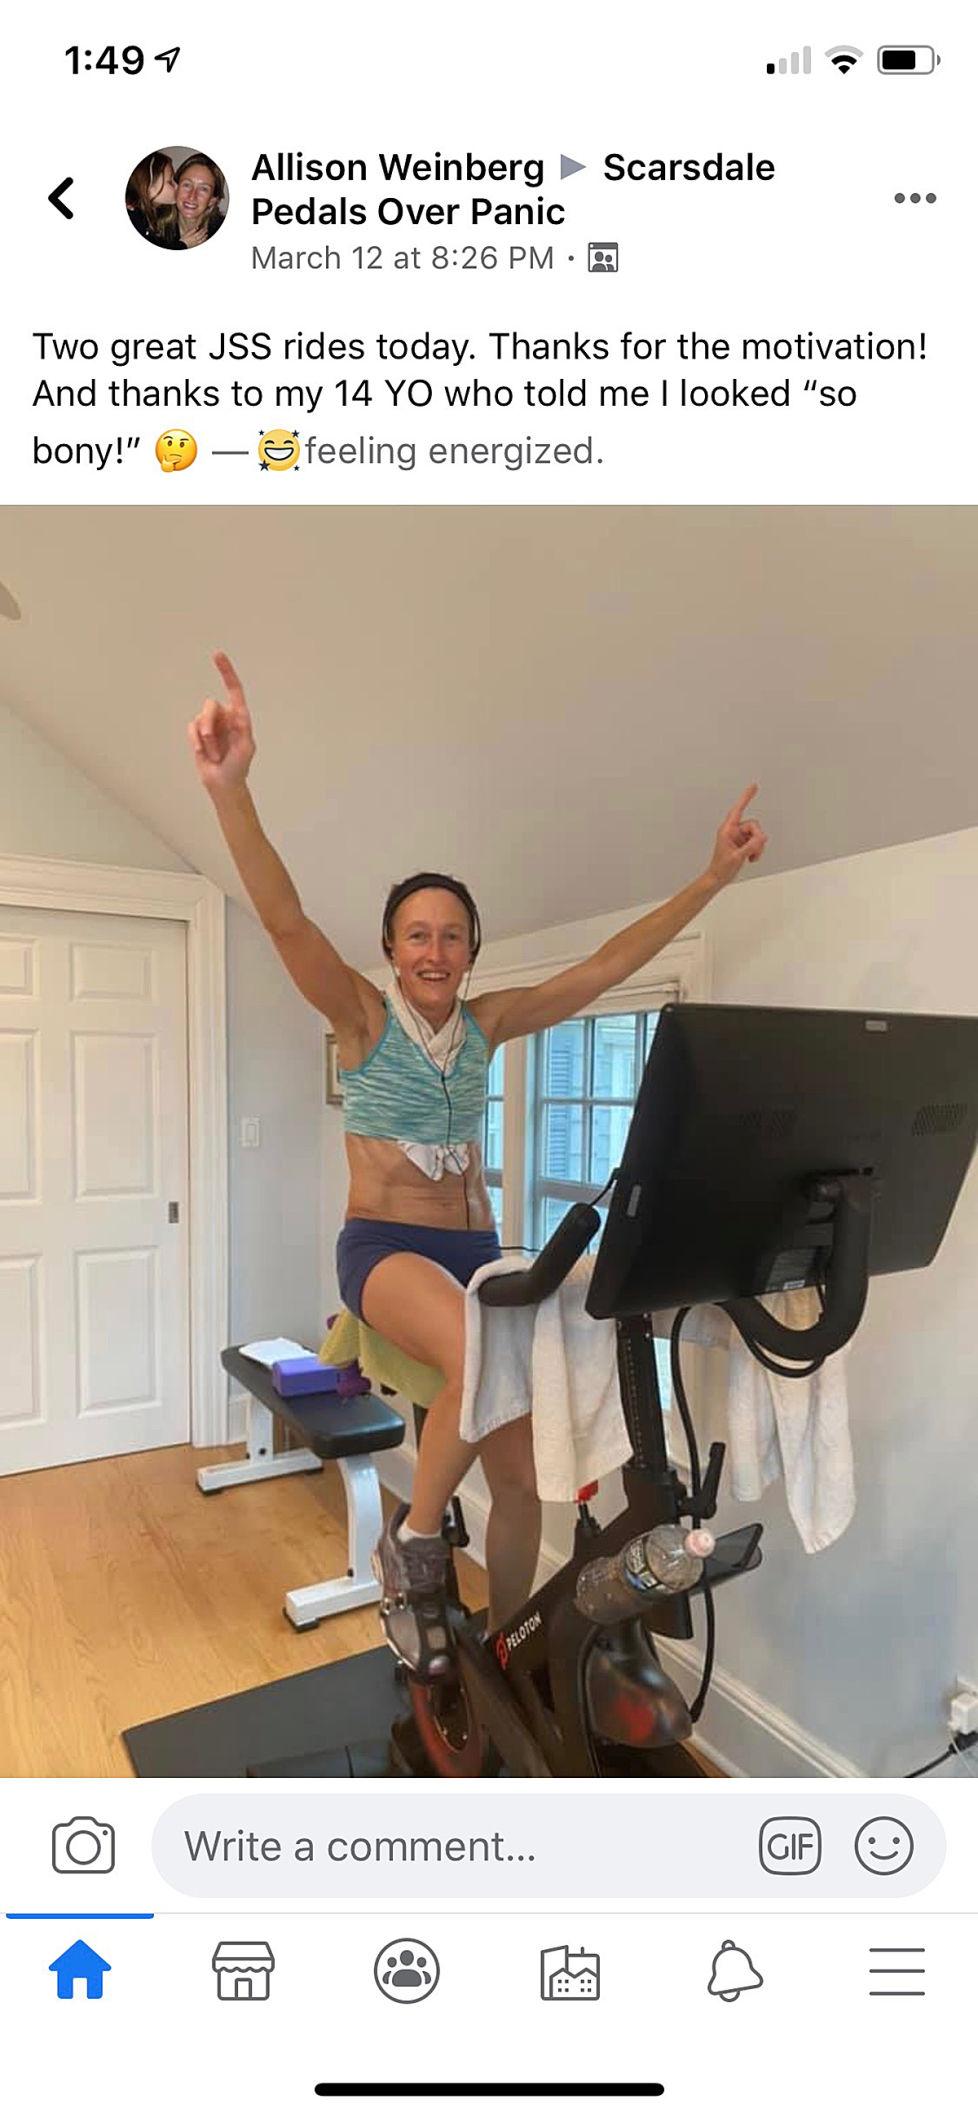 LS Peloton group pedals over panic Allison Weinberg.jpeg